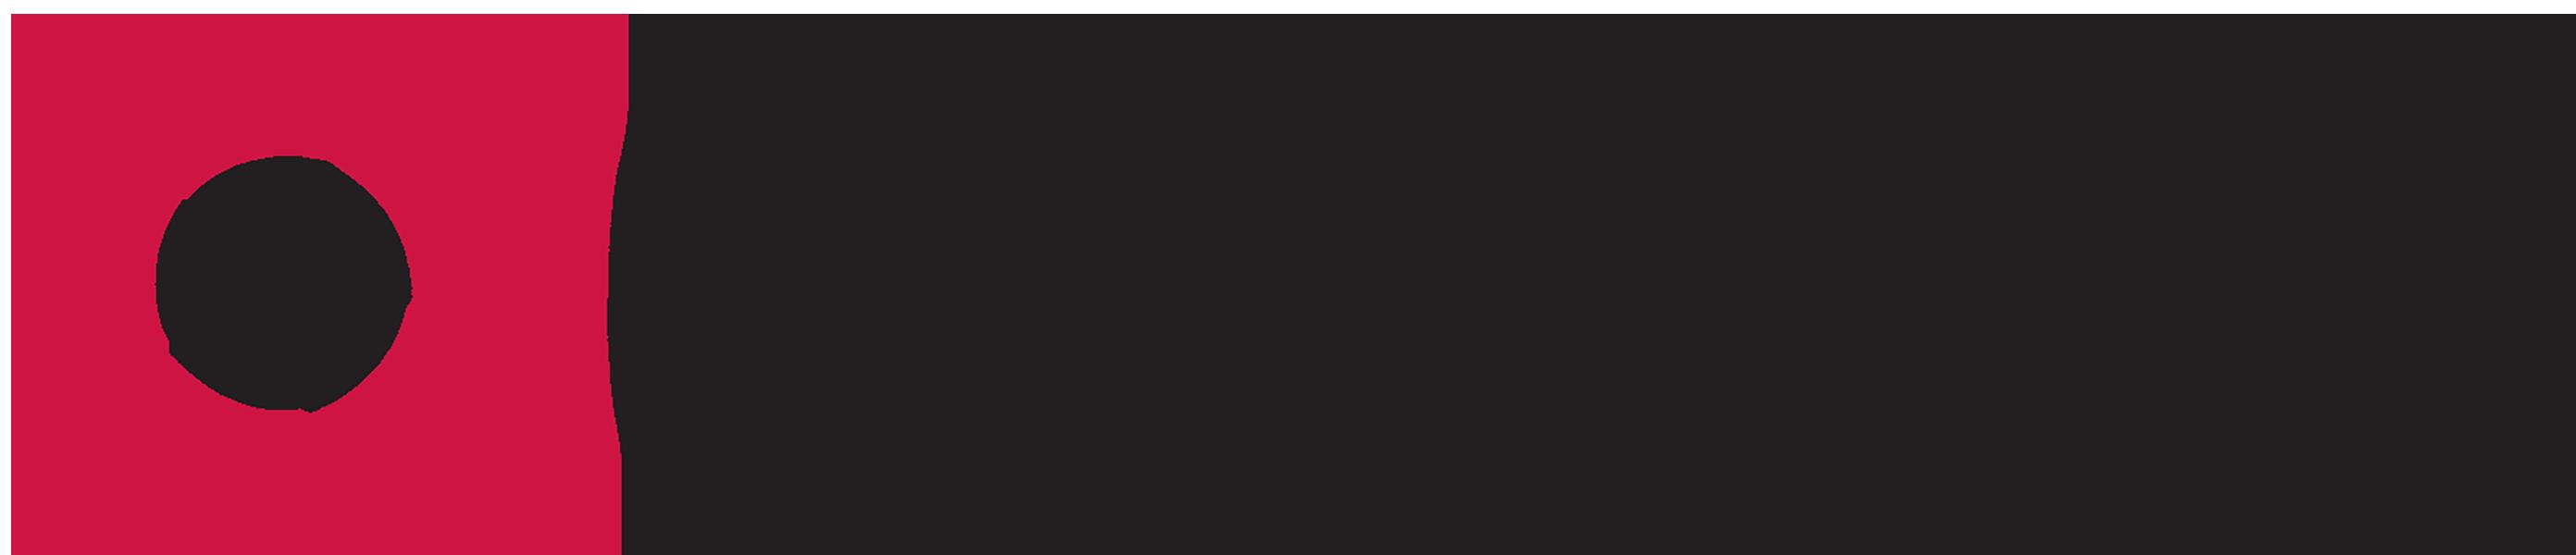 CURFLO